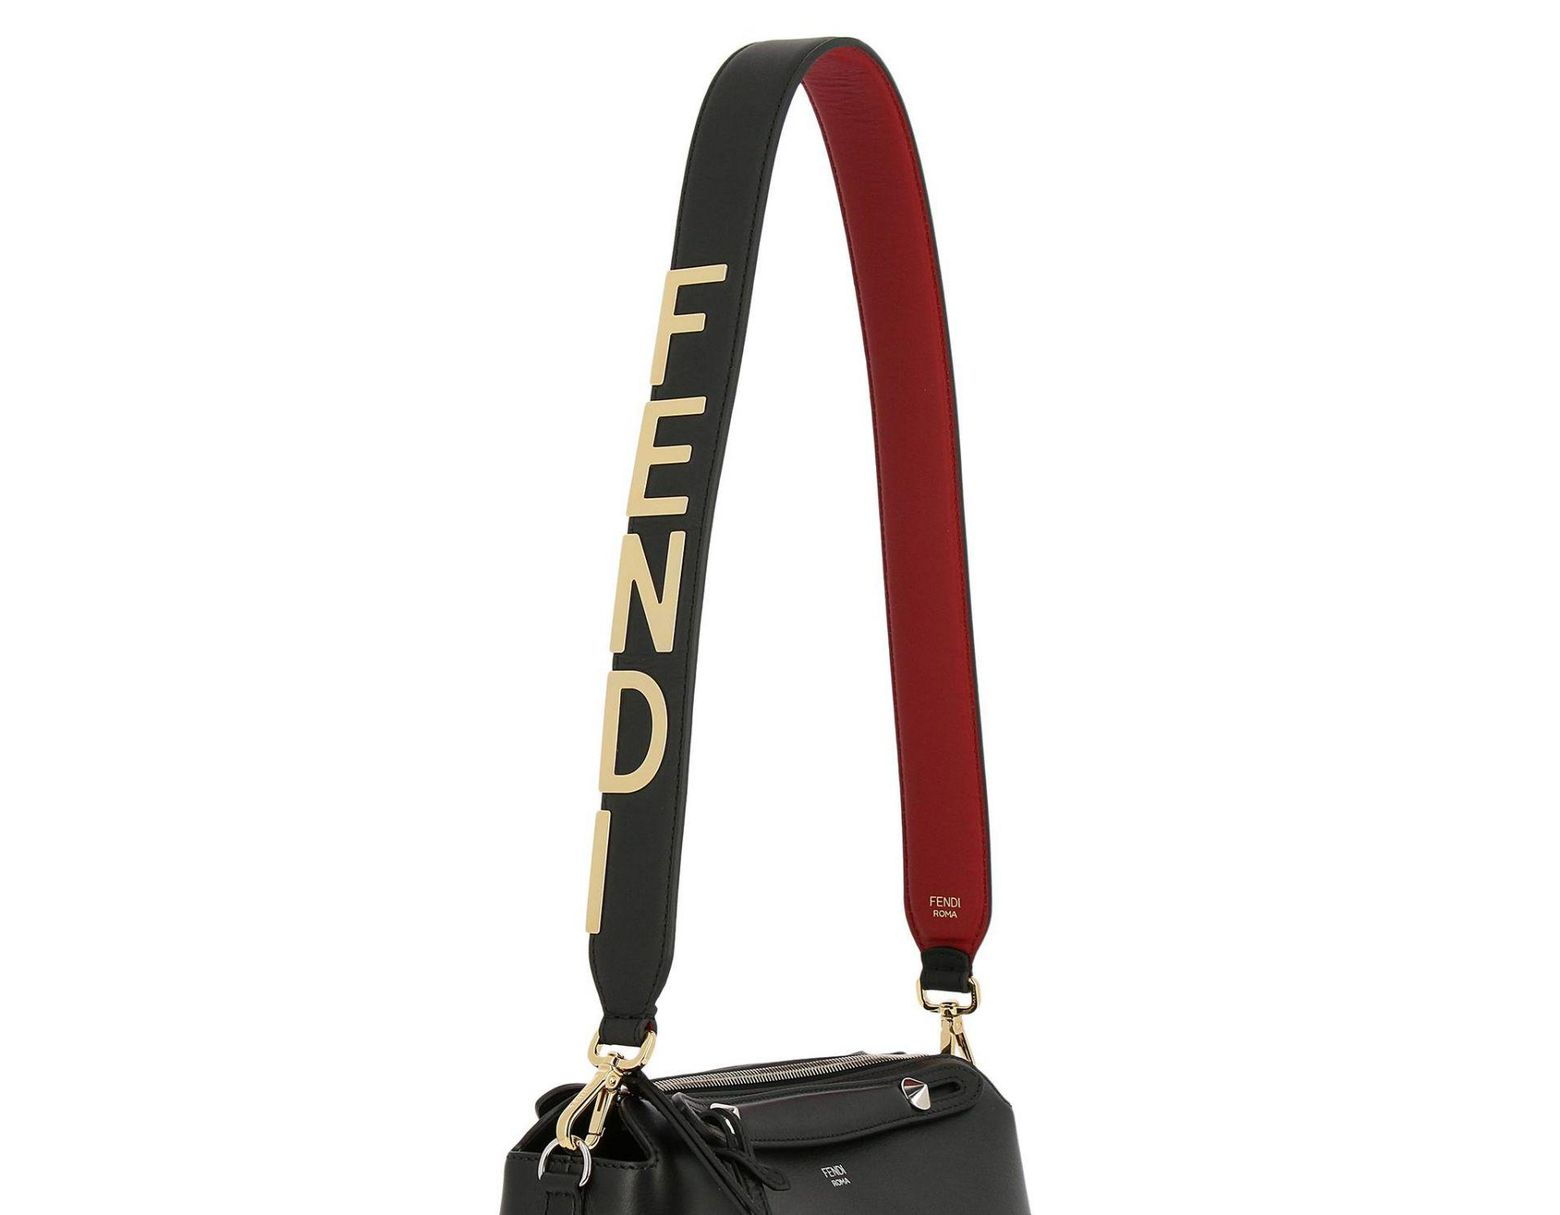 582e6b75 Women's Black Maxi Strap You Shoulder Bag In Genuine Leather Century With  Metallic Logo